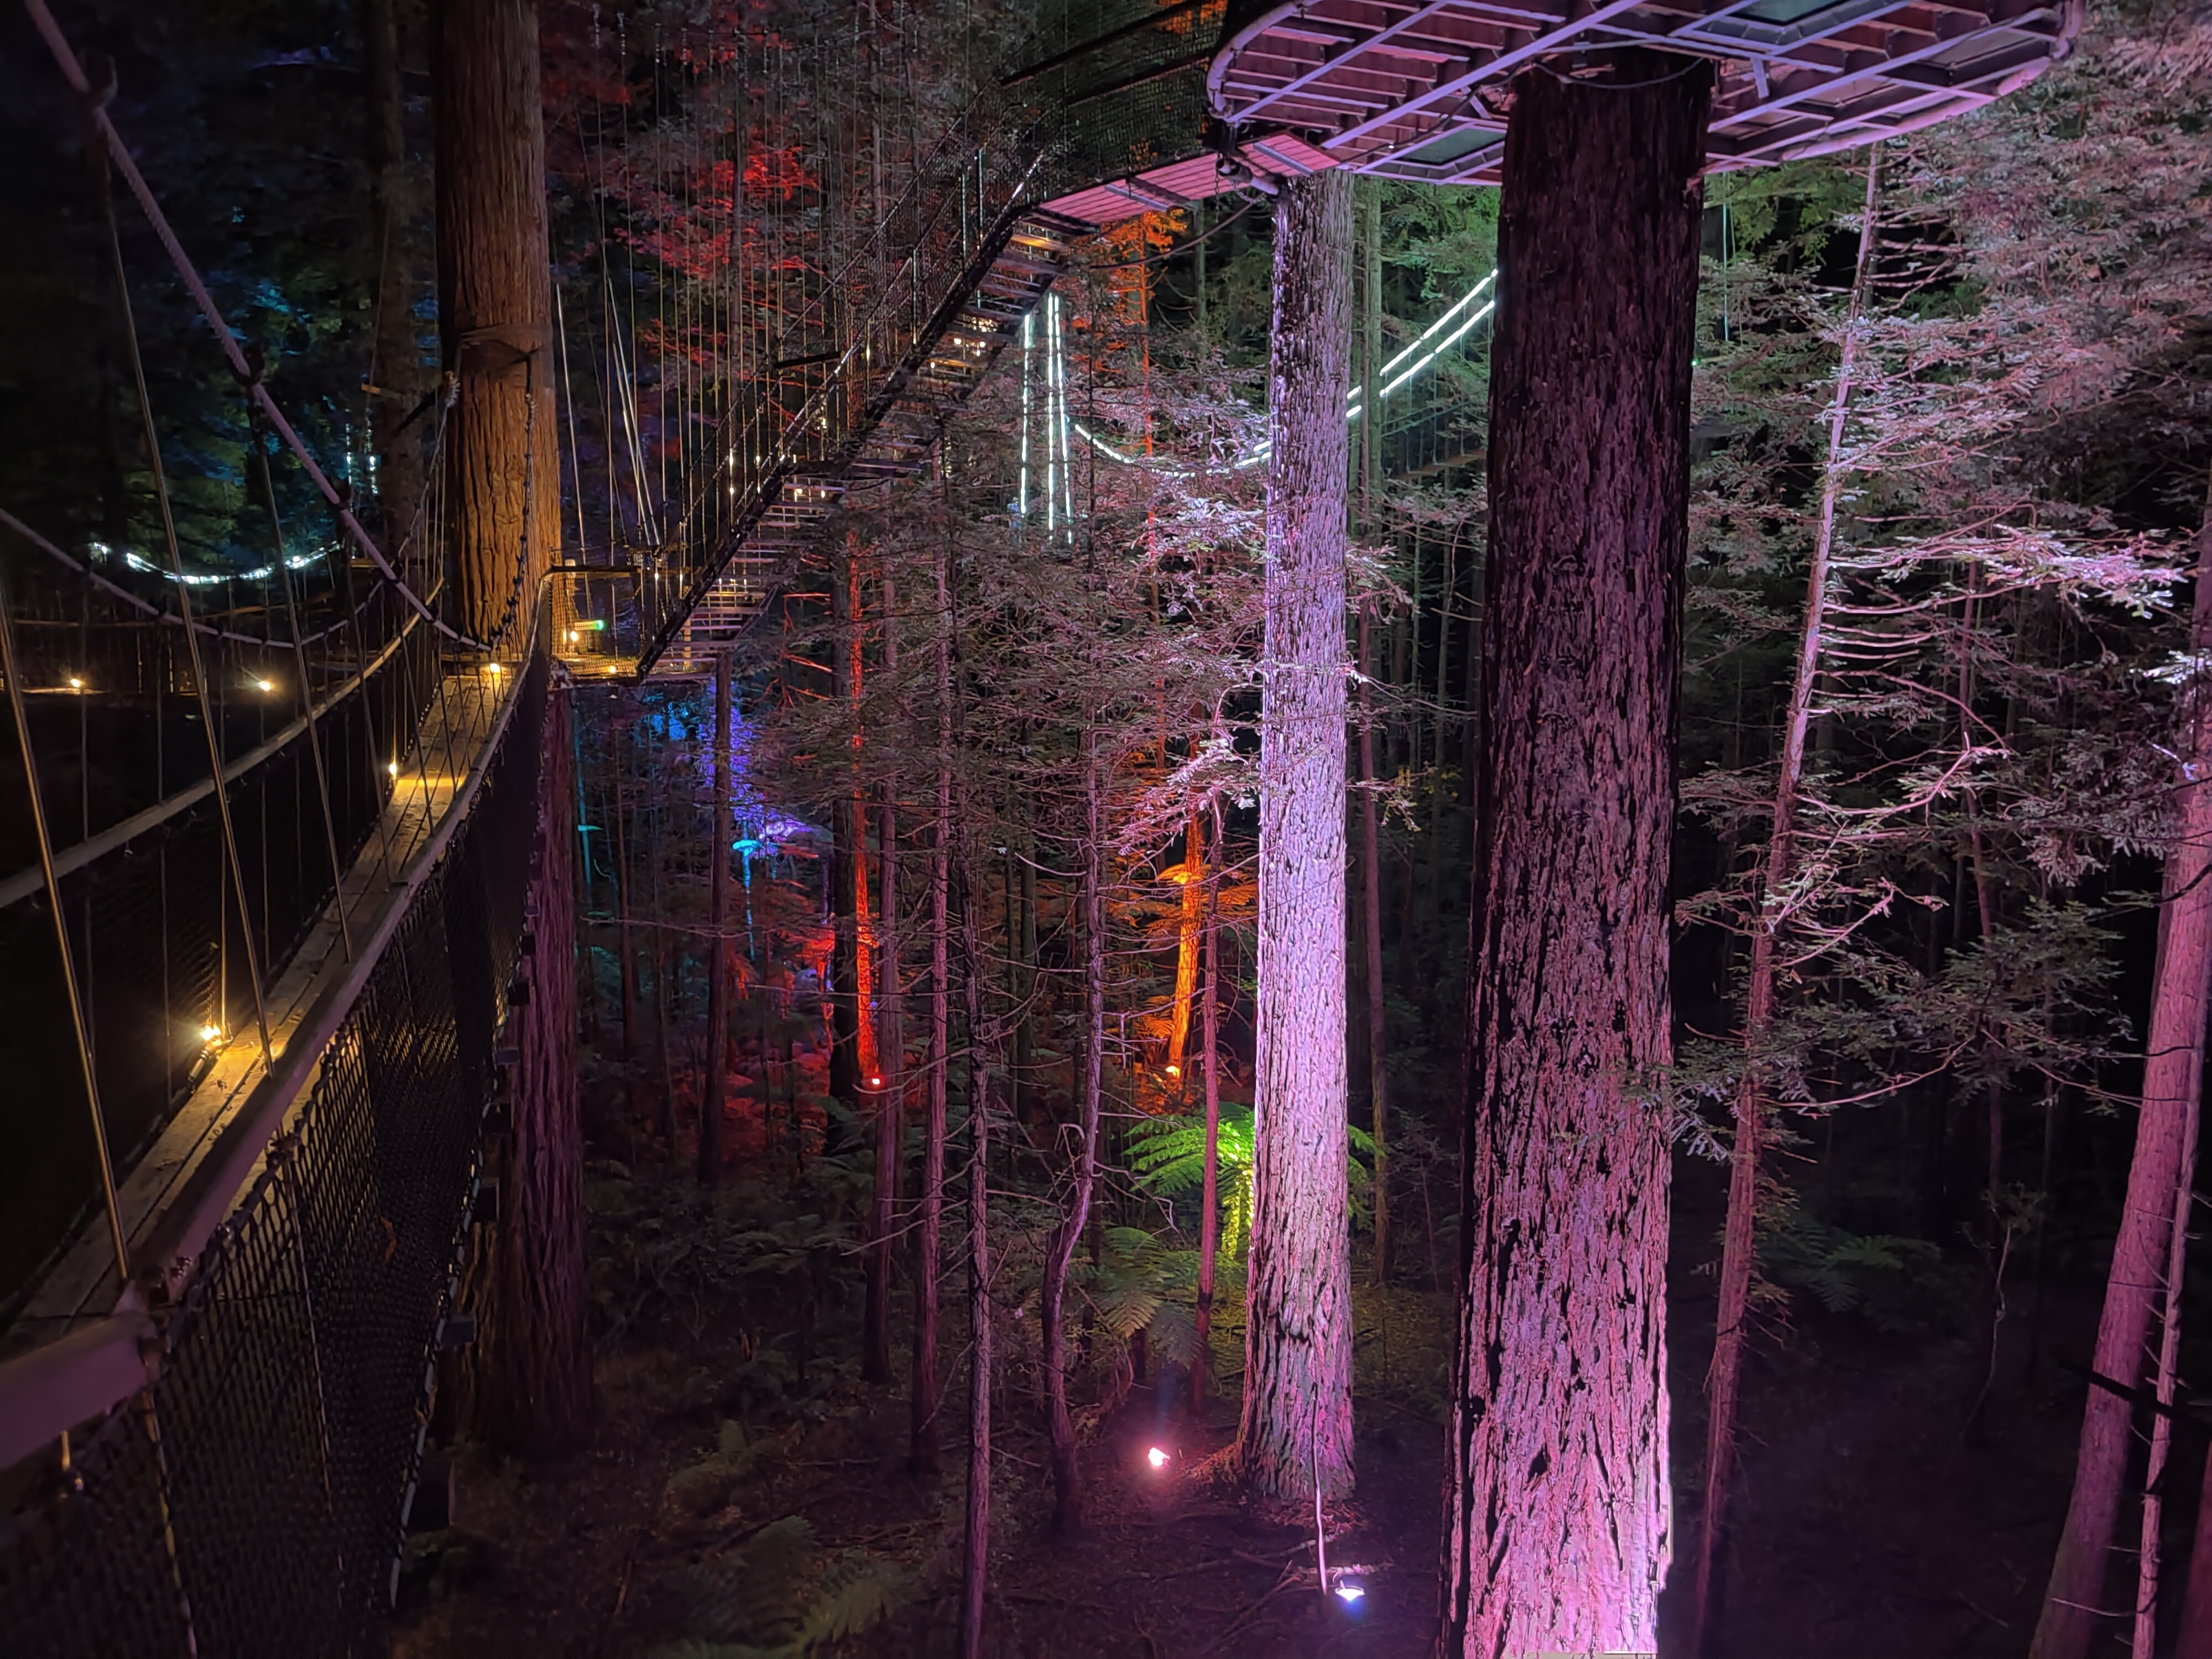 A stunning view of the Rotorua Redwoods Treewalk at night